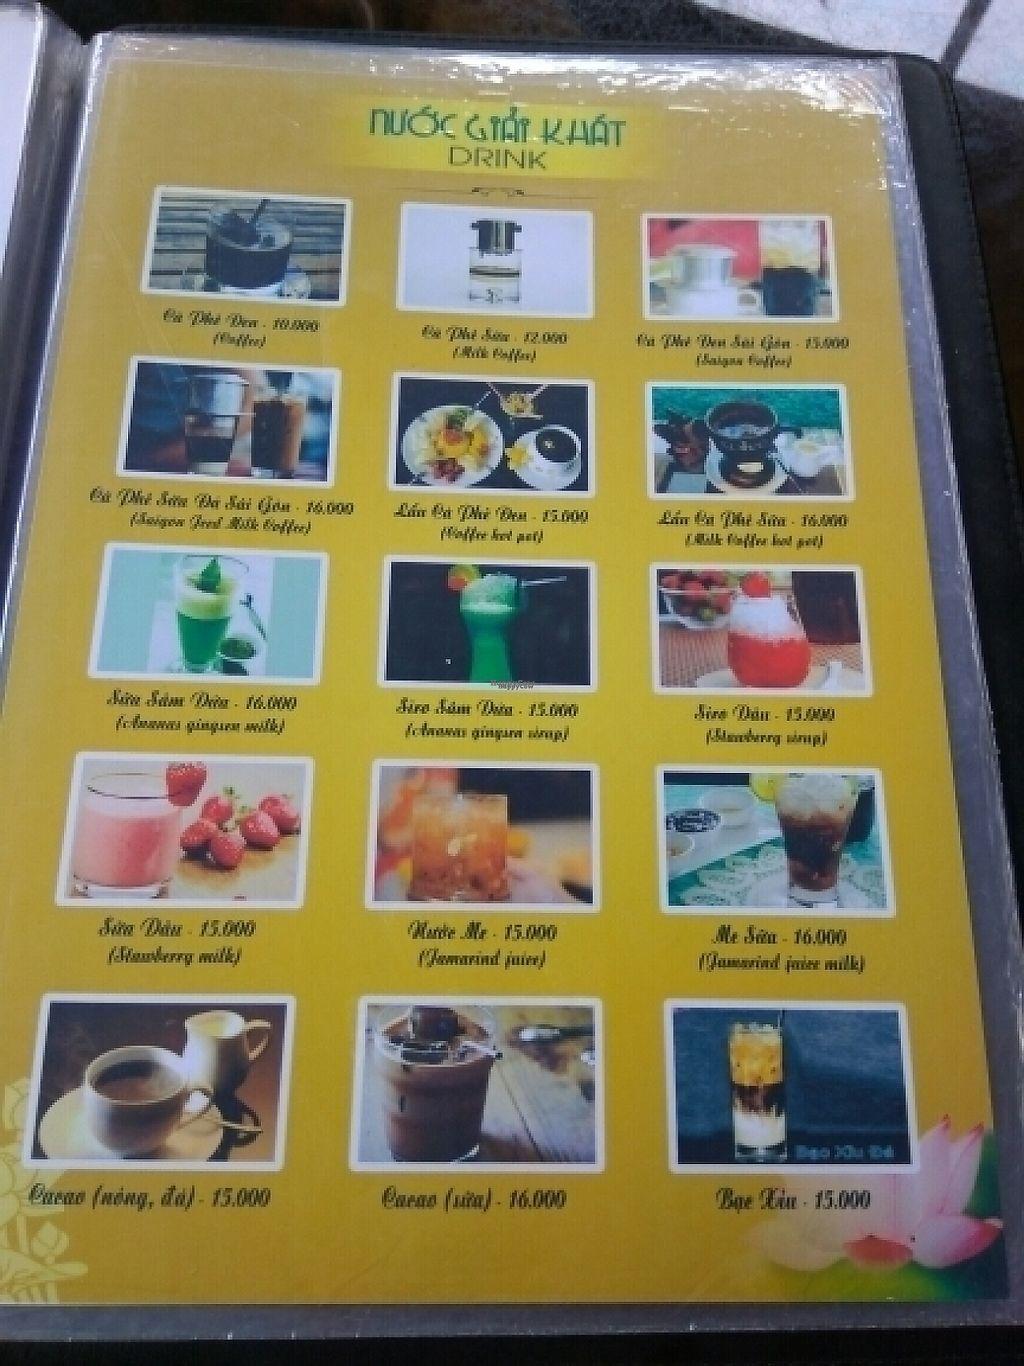 "Photo of Ngu Ha Garden Vegetarian Restaurant  by <a href=""/members/profile/Miggi"">Miggi</a> <br/>Menu 8 <br/> January 9, 2017  - <a href='/contact/abuse/image/82947/209840'>Report</a>"